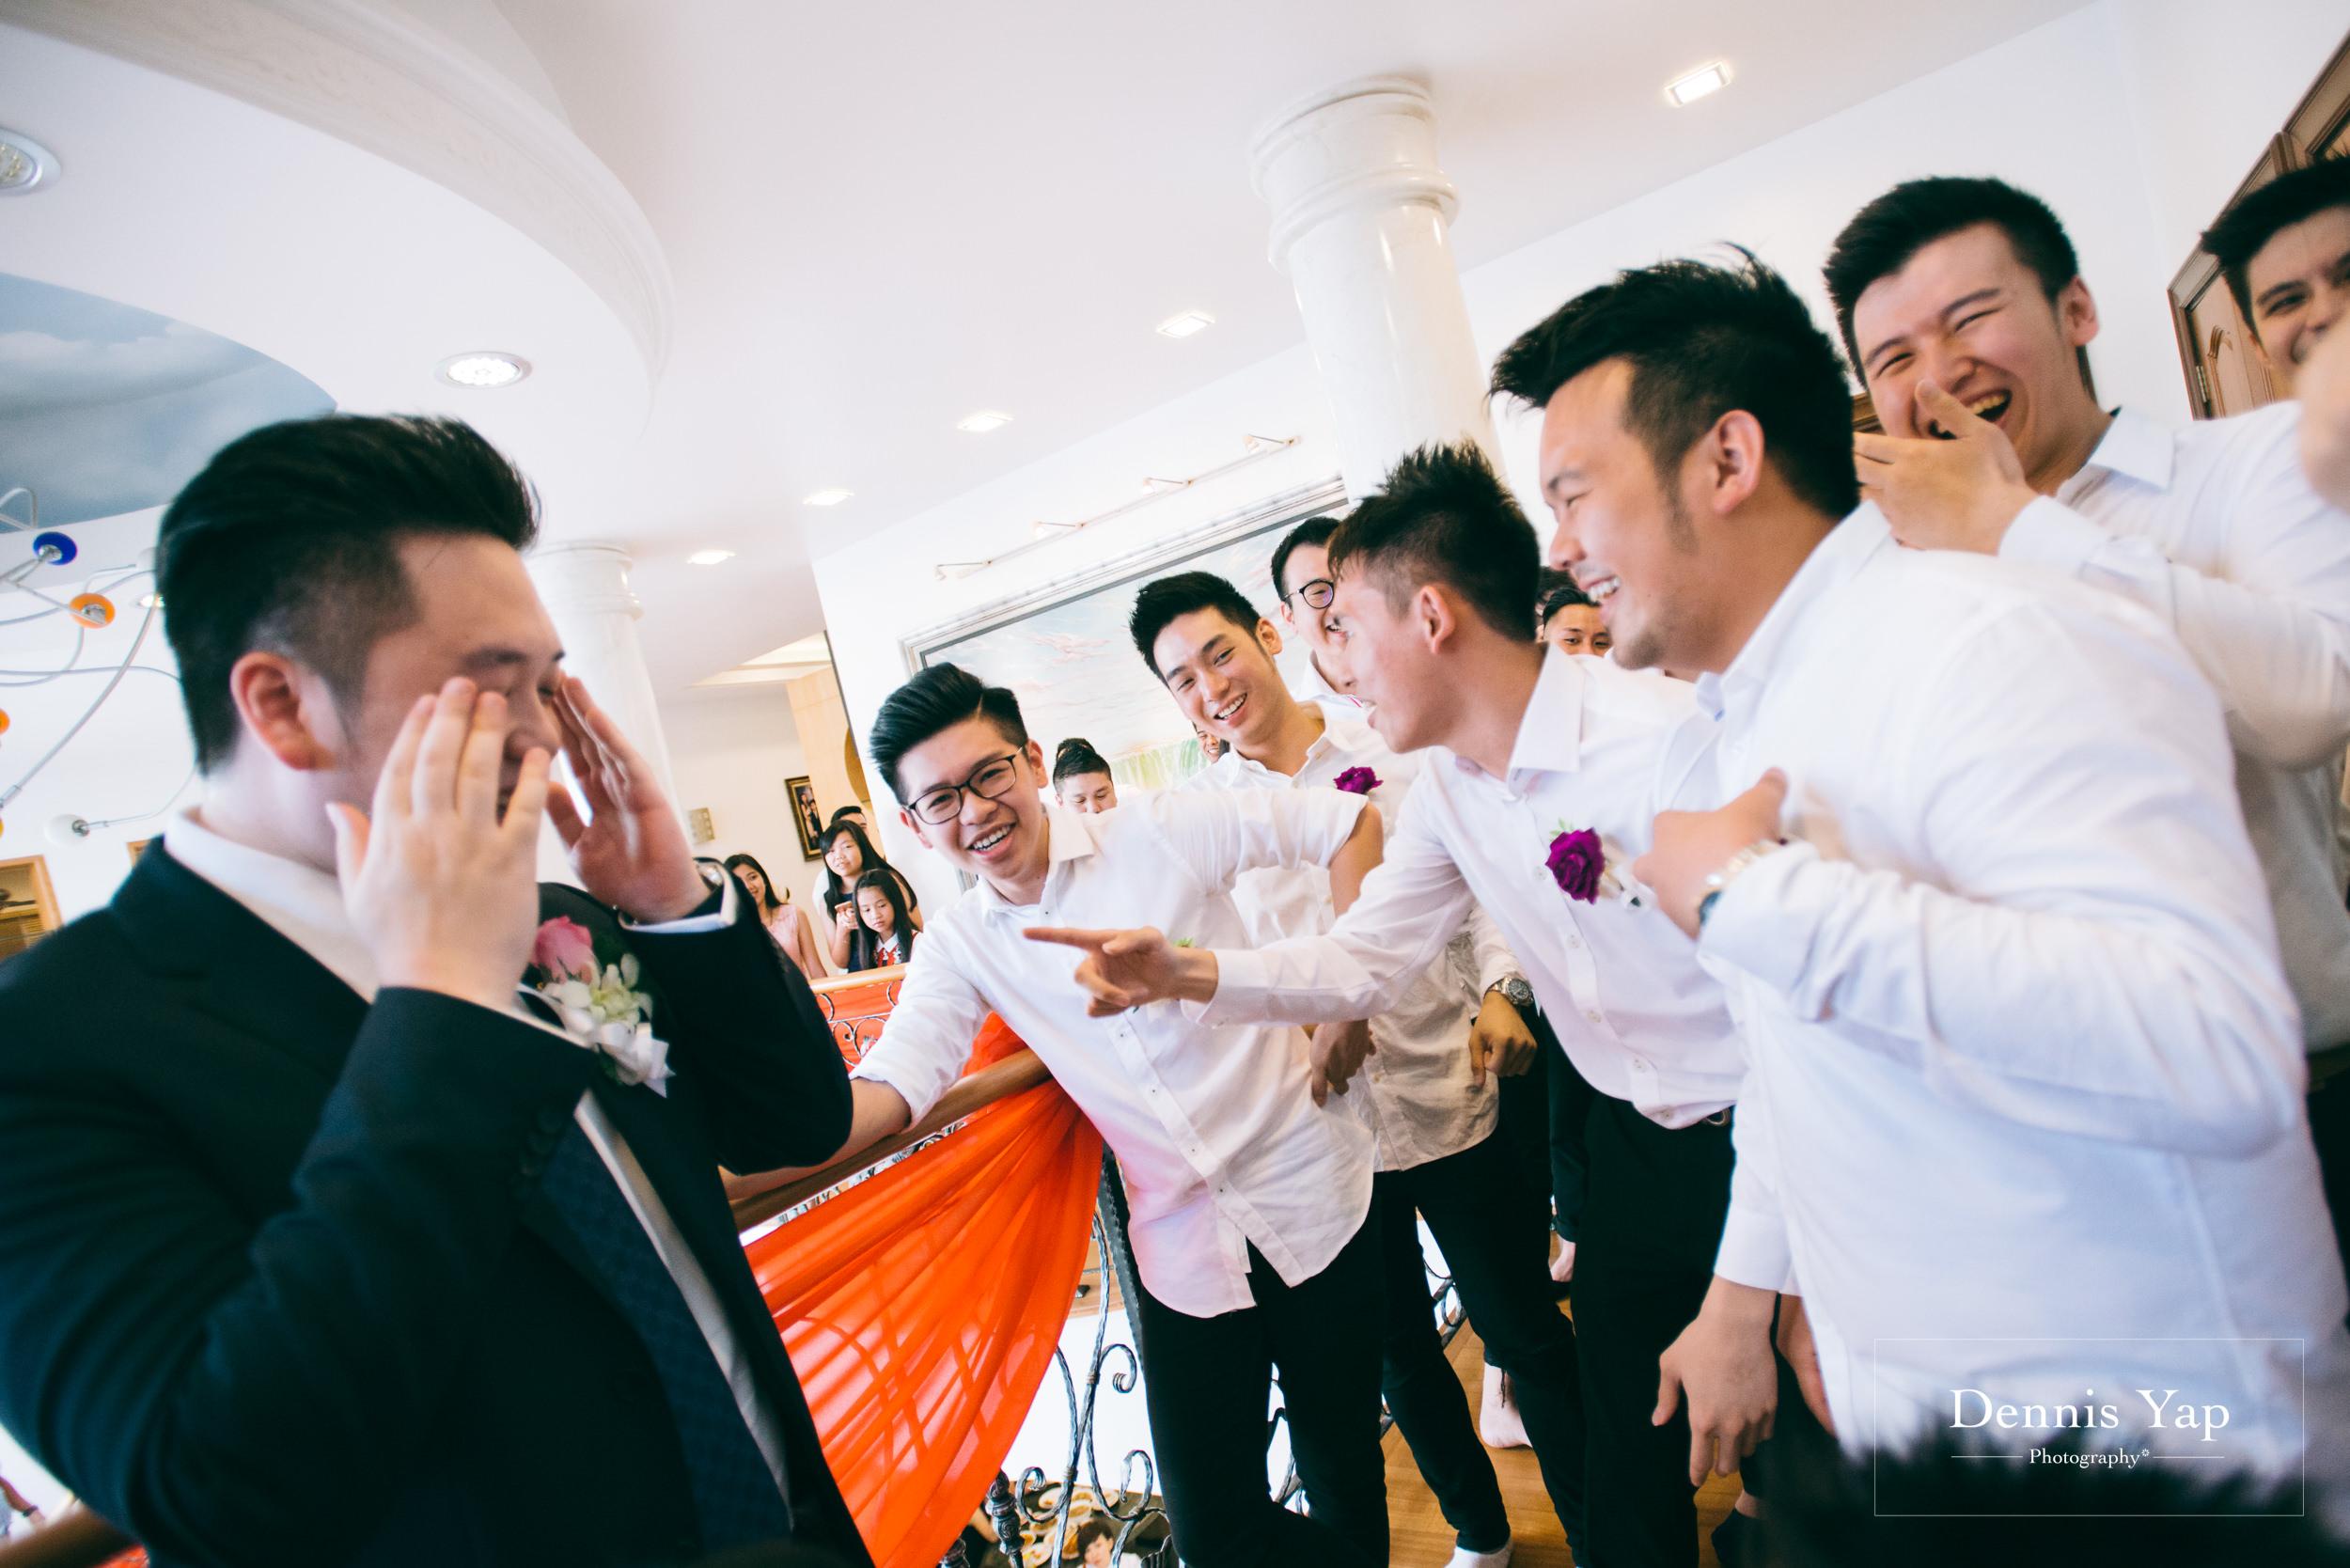 ivan constance wedding day renaissance hotel dennis yap photography-22.jpg